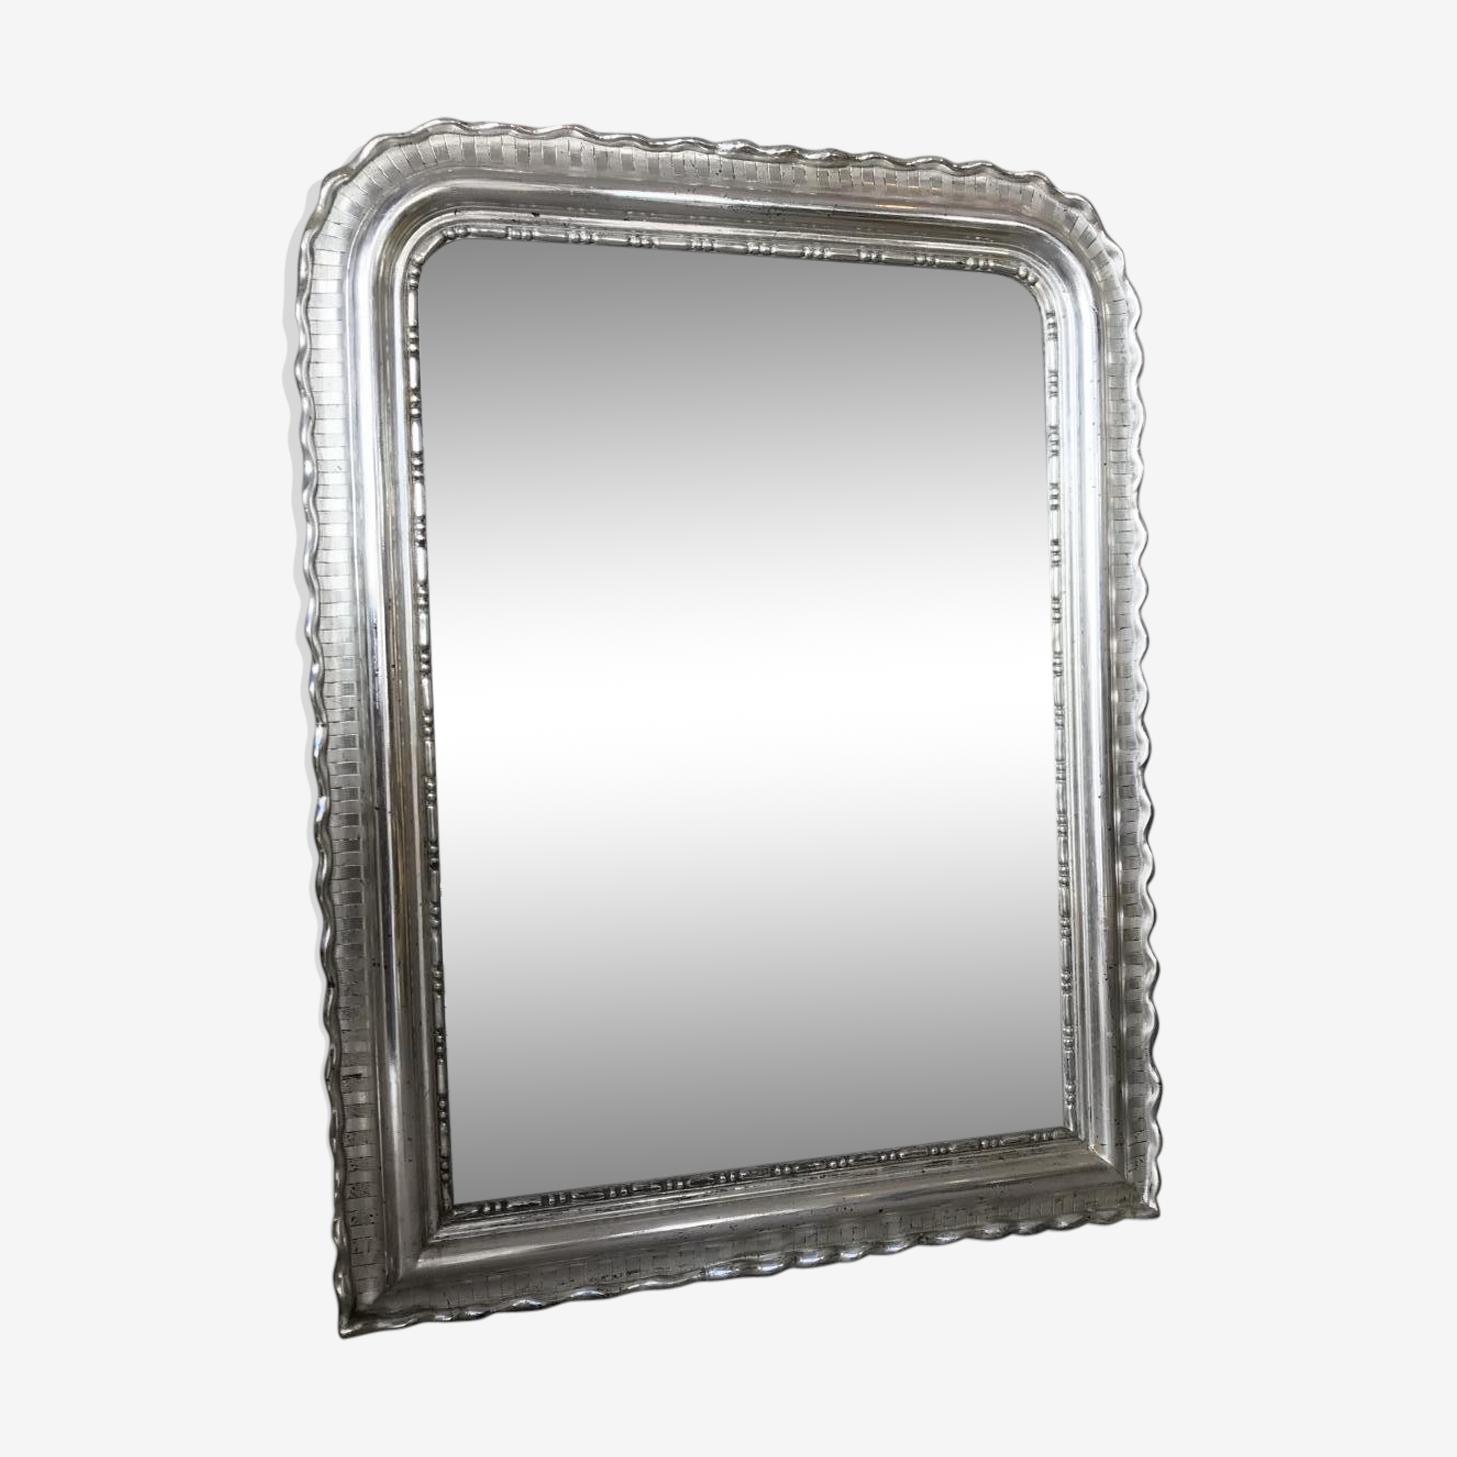 Miroir en or blanc, milieu XIXe H 118 x 90 cm